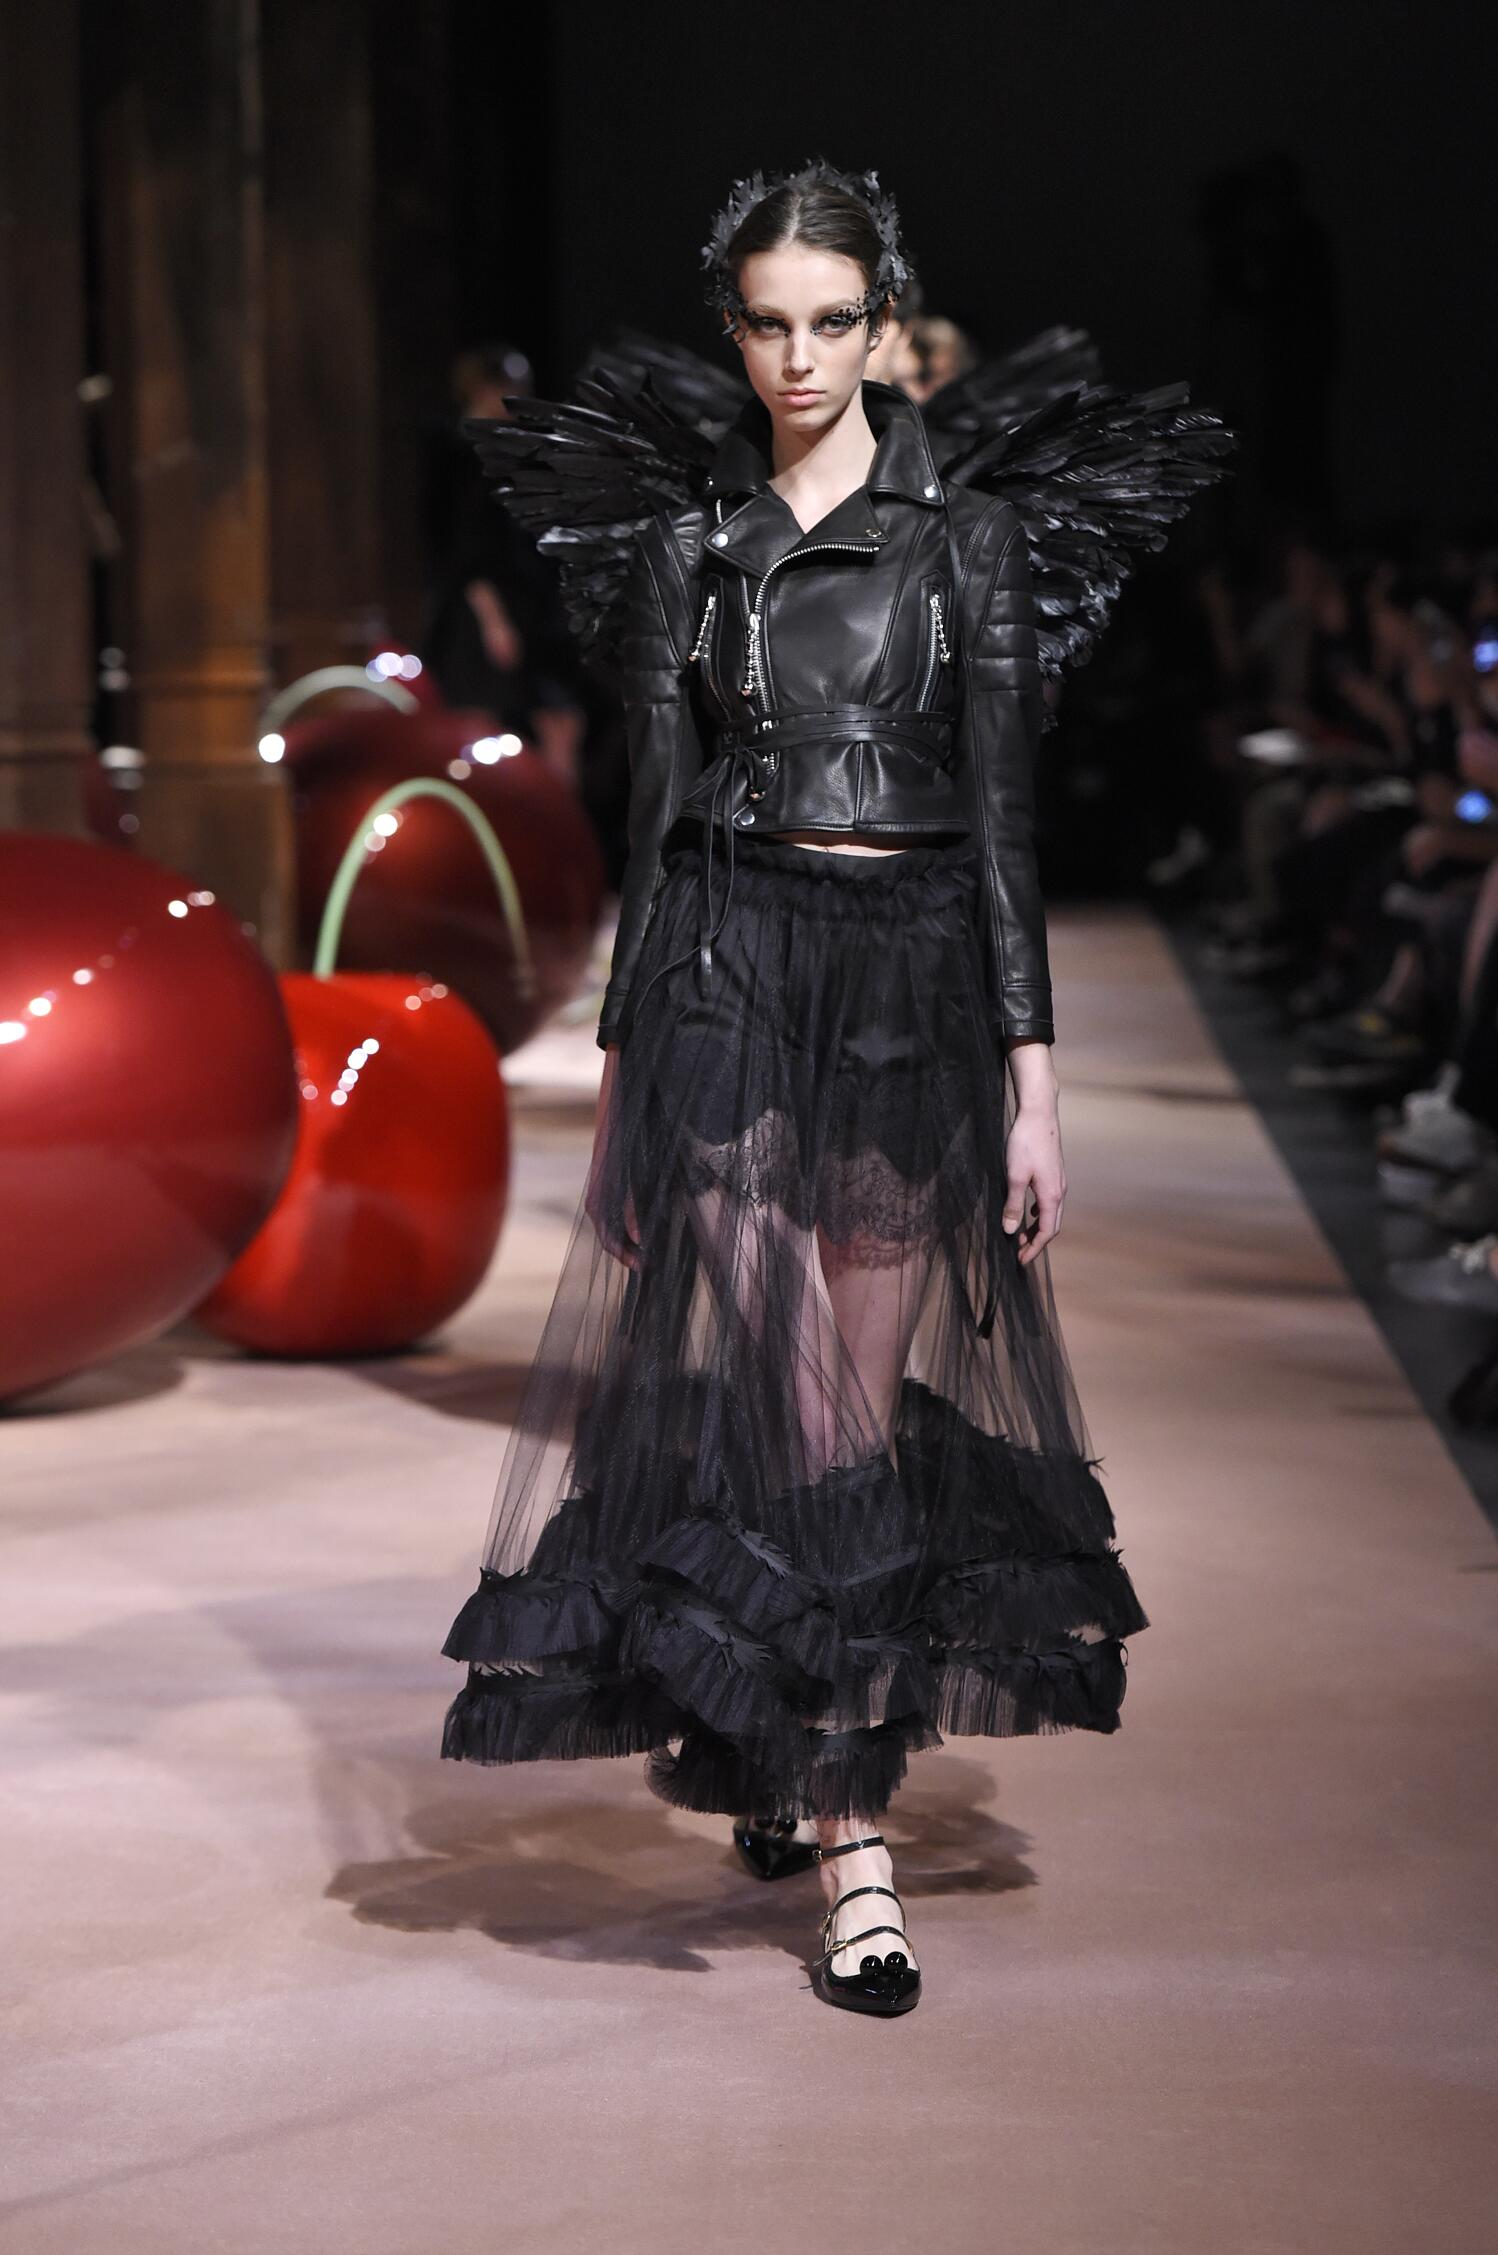 2015 Catwalk Undercover Woman Fashion Show Summer